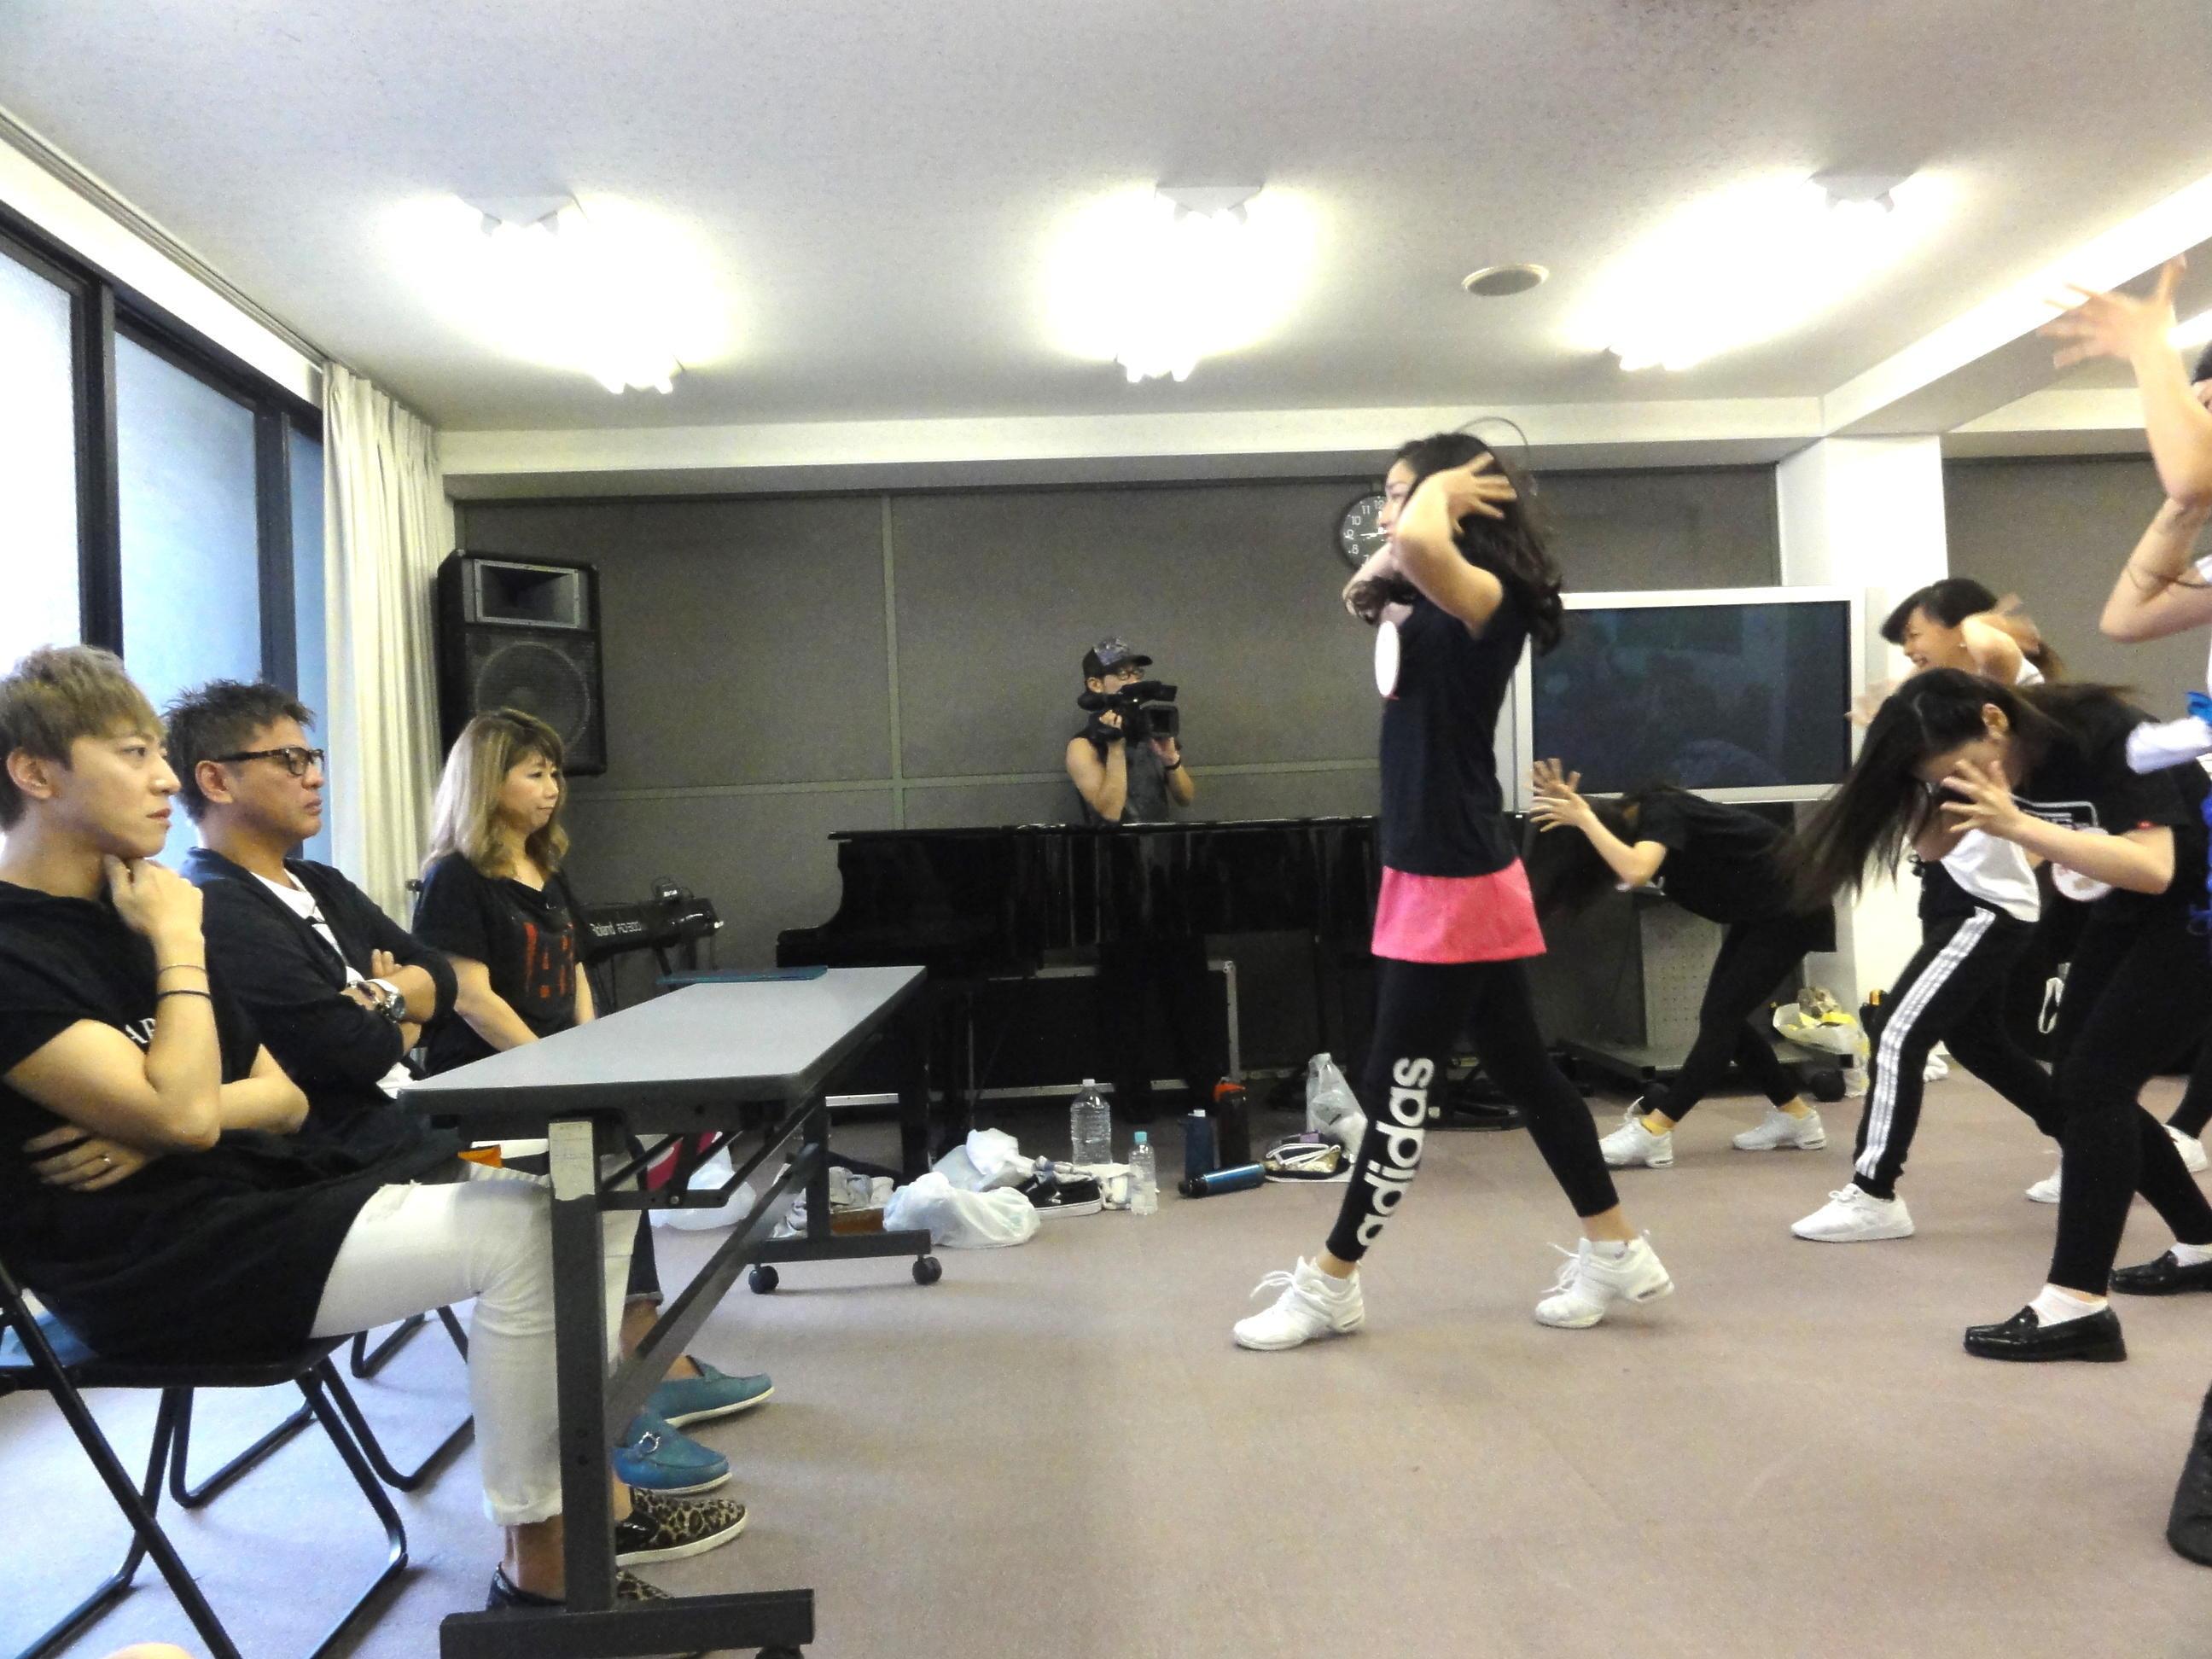 http://news.yoshimoto.co.jp/20170727165440-c8c9a36579e41aa0e767ab3d25609daa09c39b95.jpg